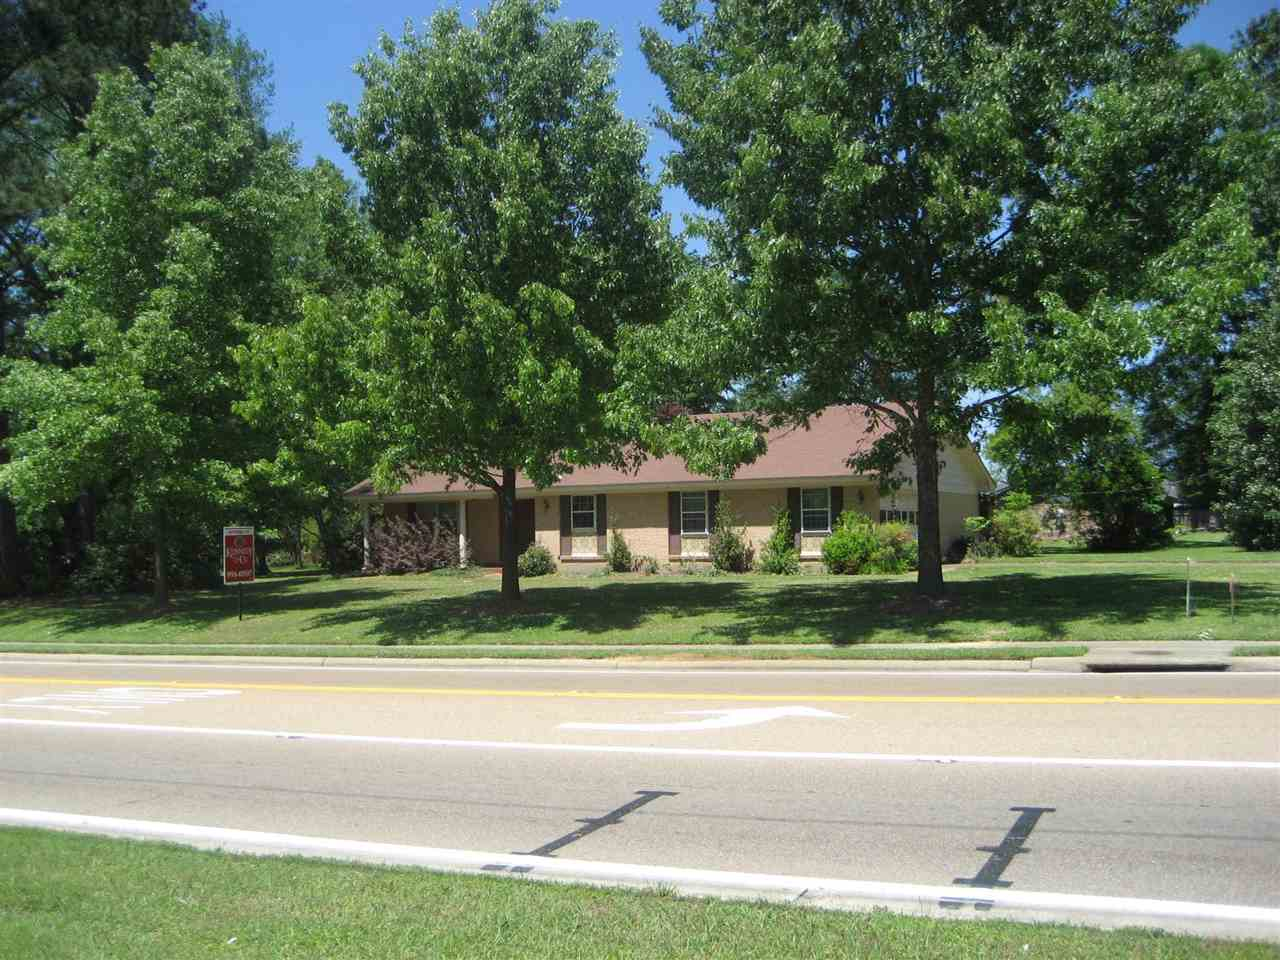 Real Estate for Sale, ListingId: 35619570, Ridgeland,MS39157